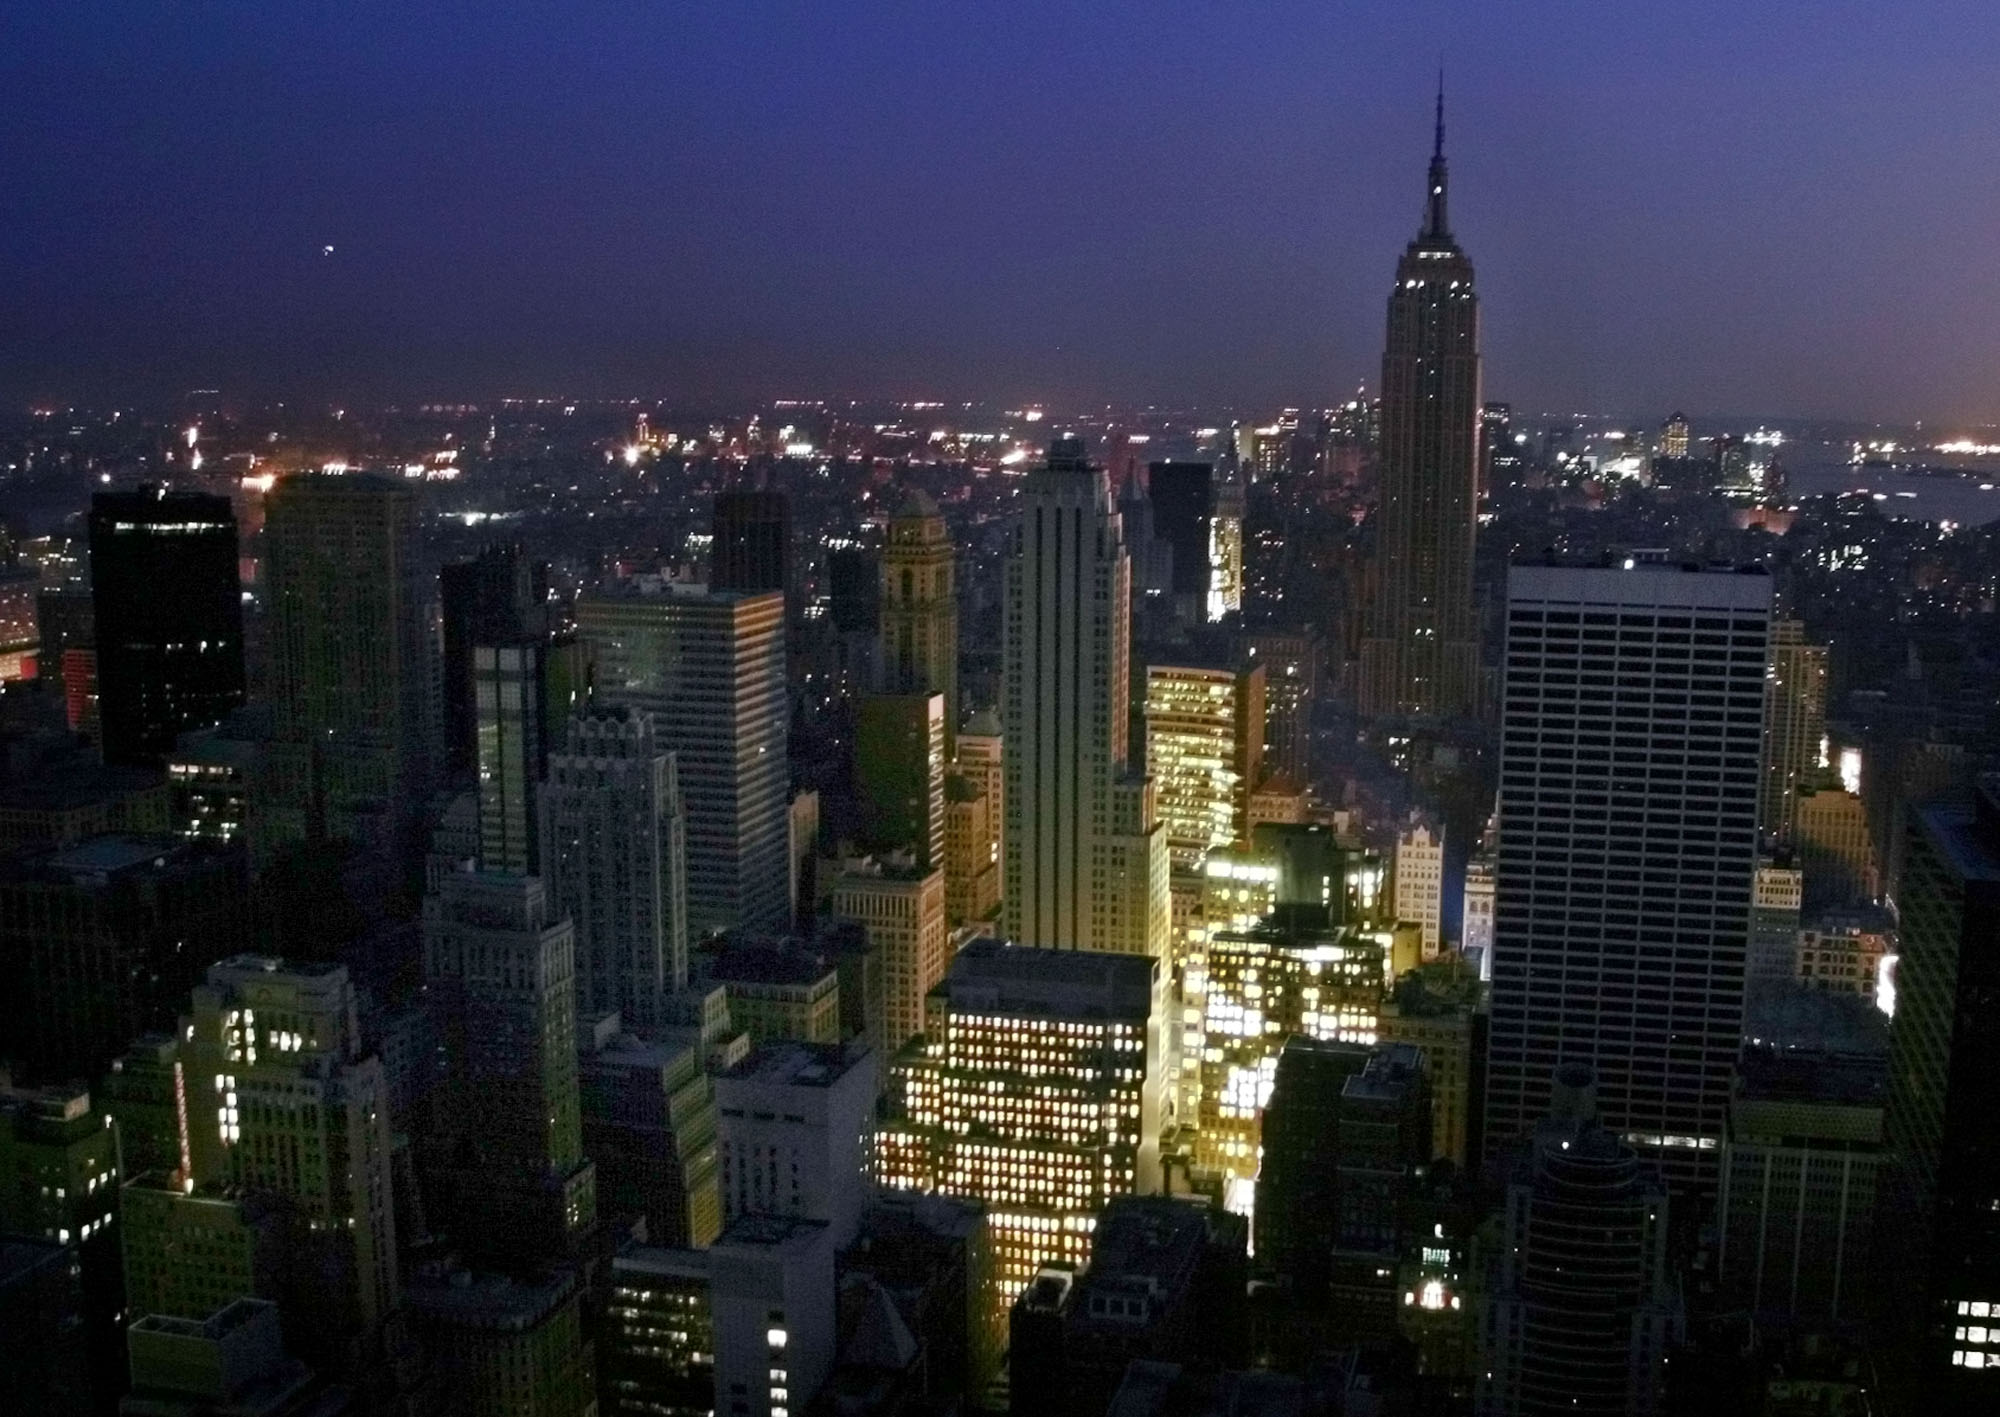 Pictures Of New York City U0026 39 S 2003 Blackout  U2014 Quartz